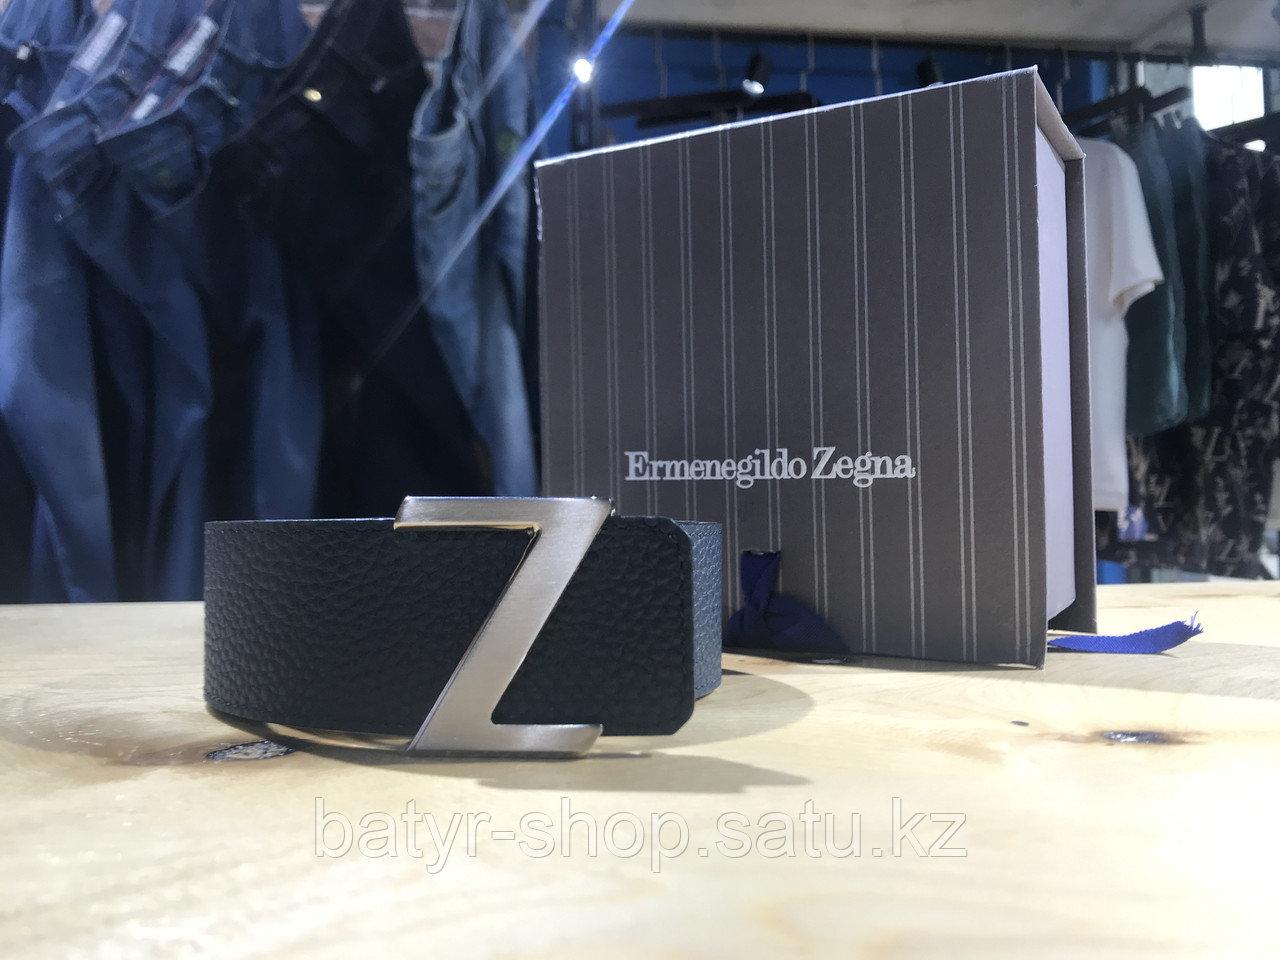 Ремень Ermenegildo Zegna (0073)